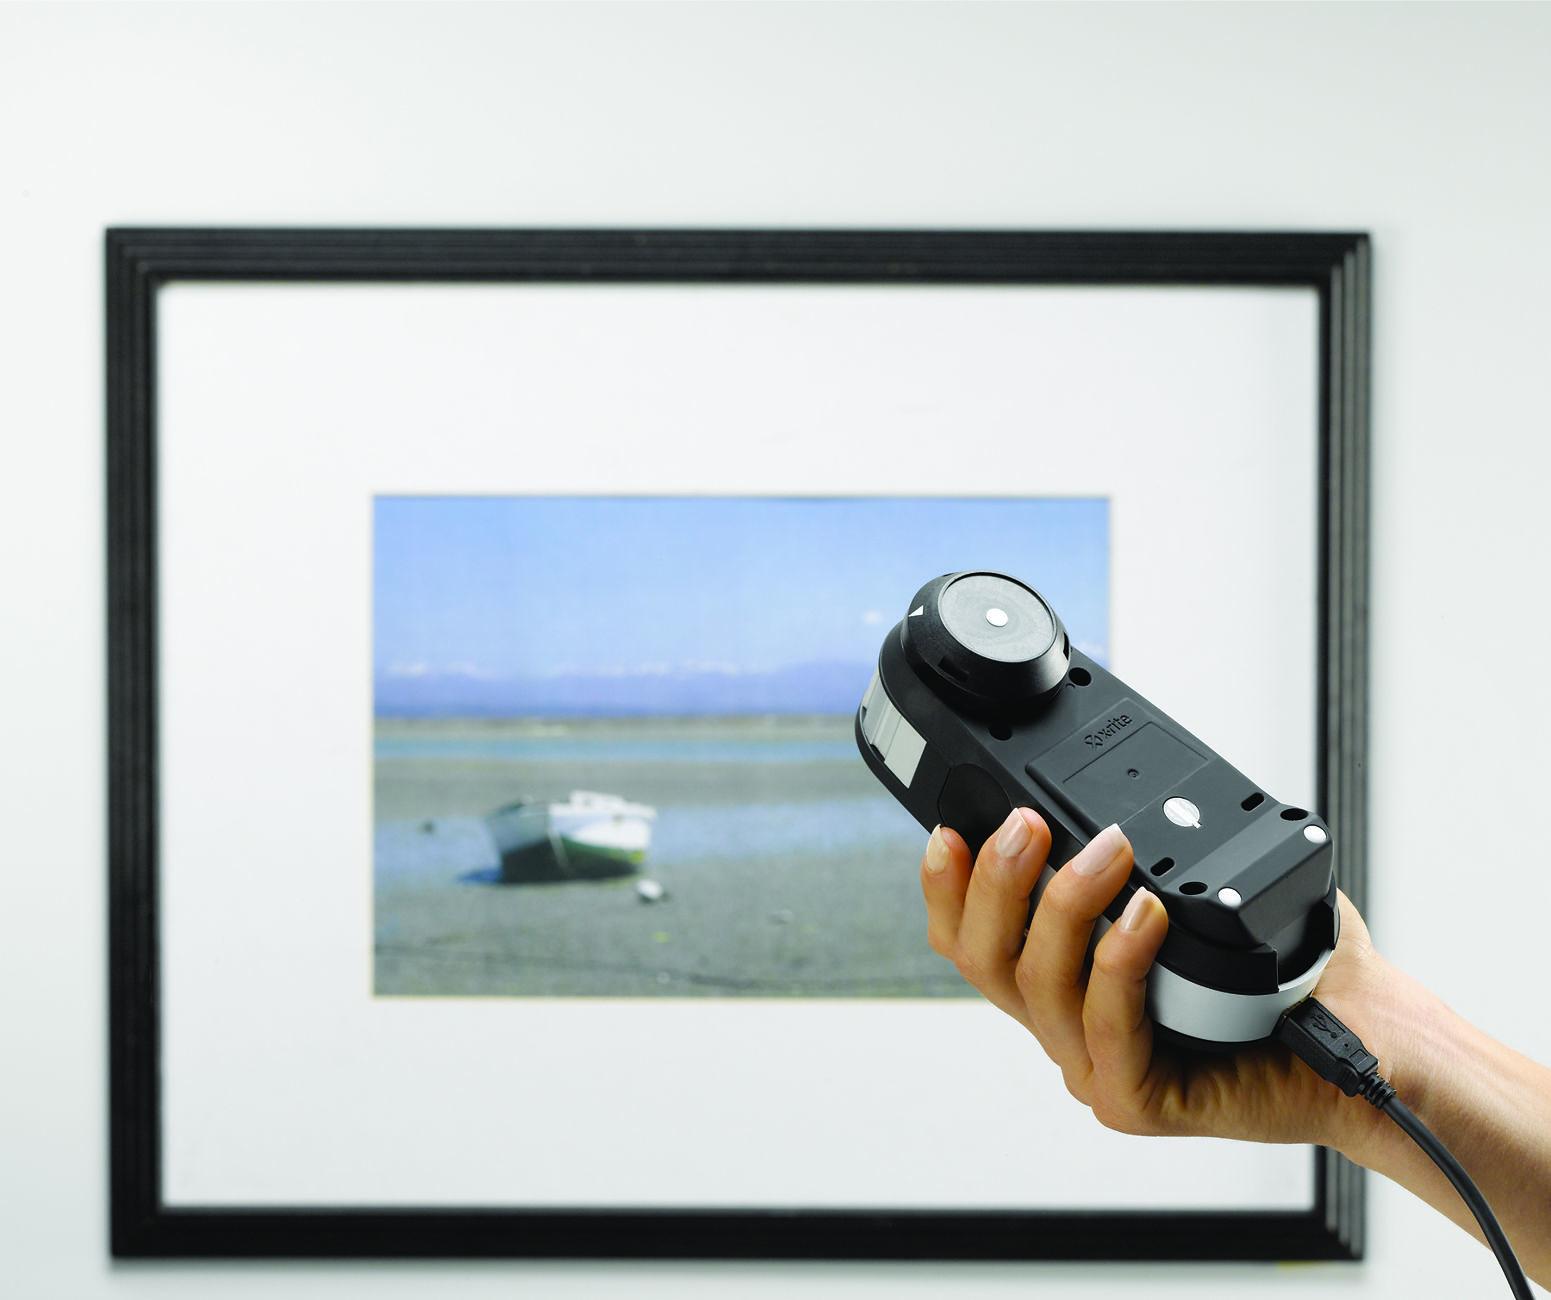 X-Rite i1Photo Pro 2 Image